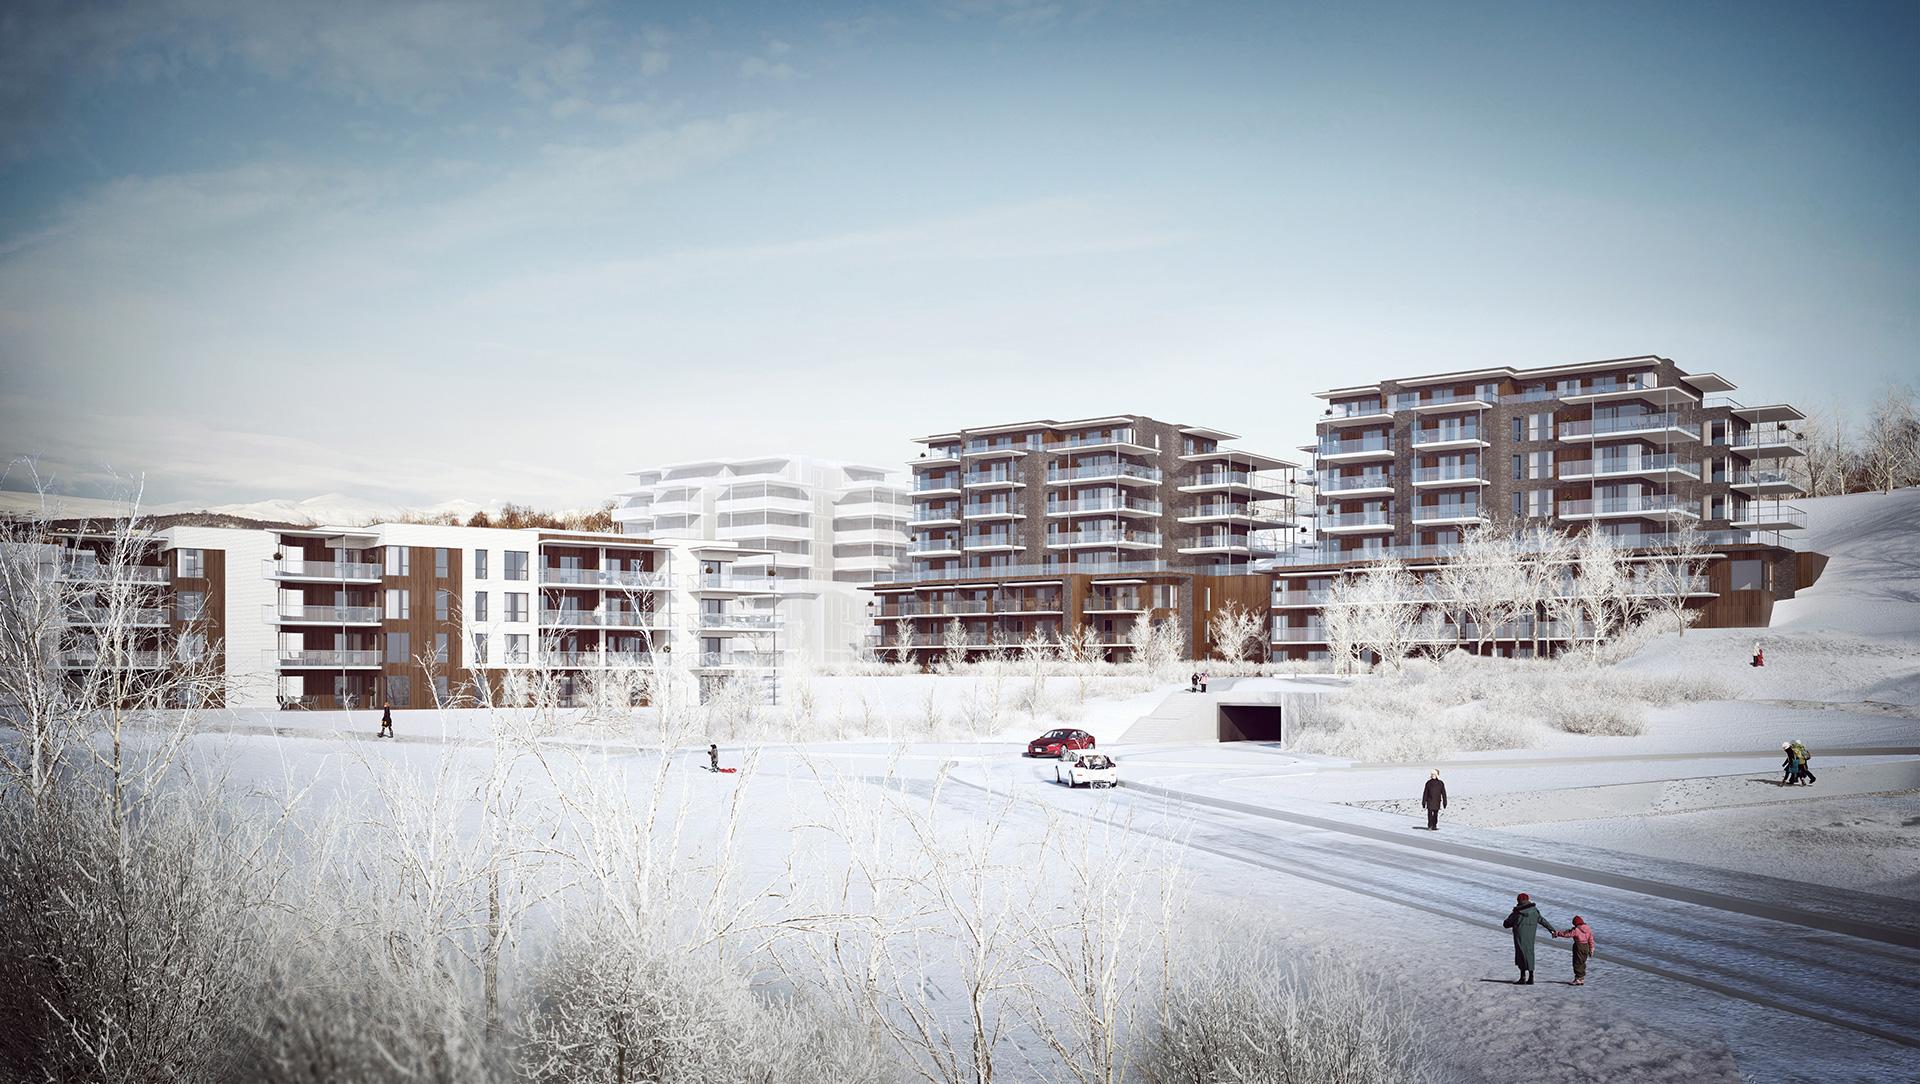 Tromso-01.jpg